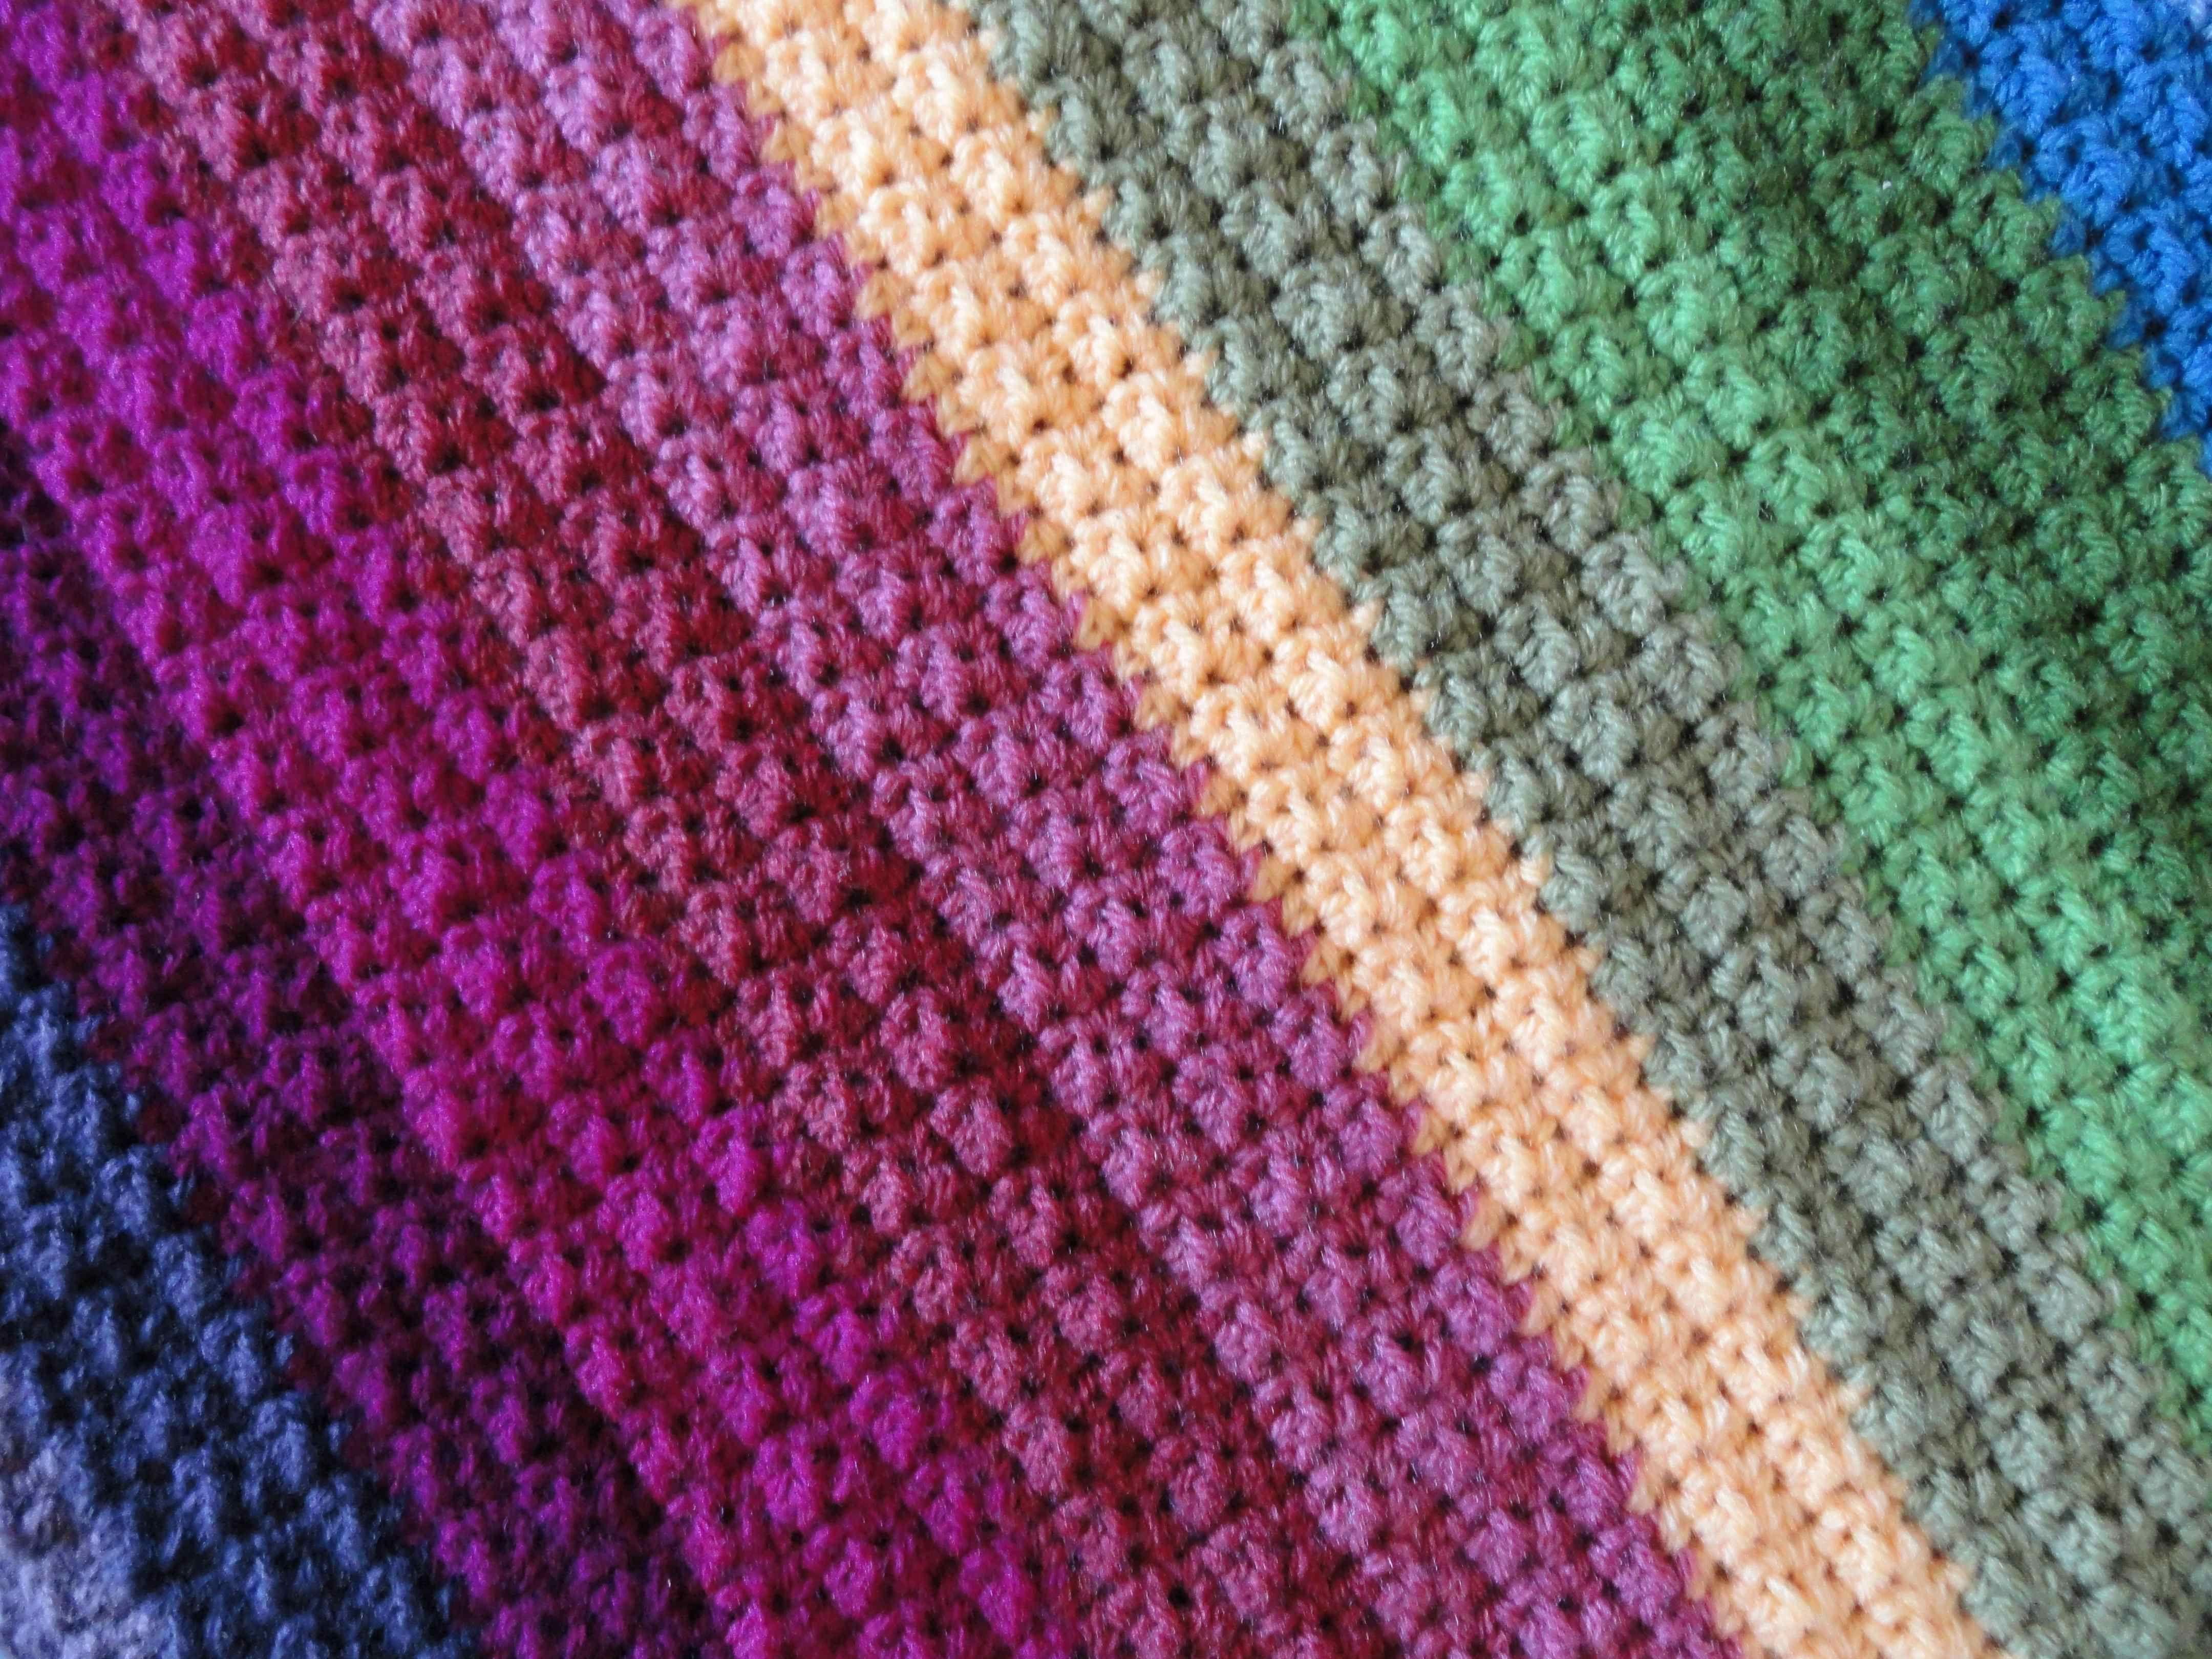 crochet afghan patterns - Google Search